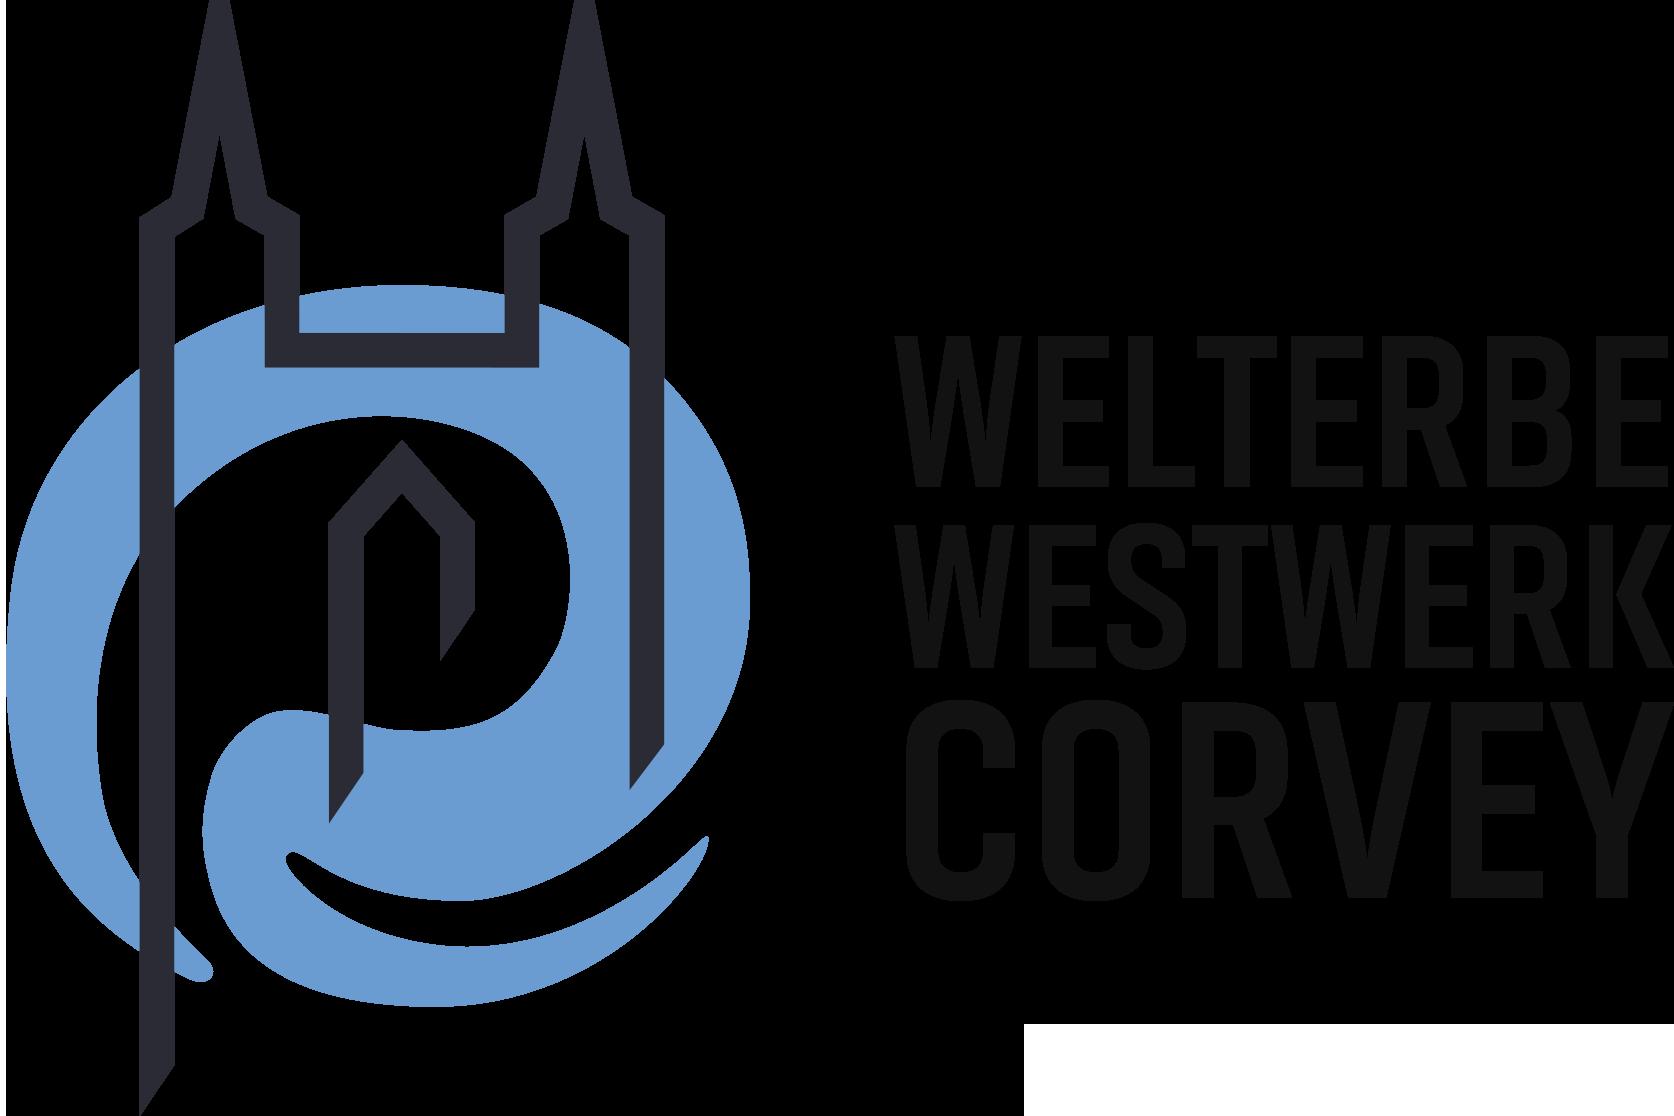 Welterbe Westwerk Corvey